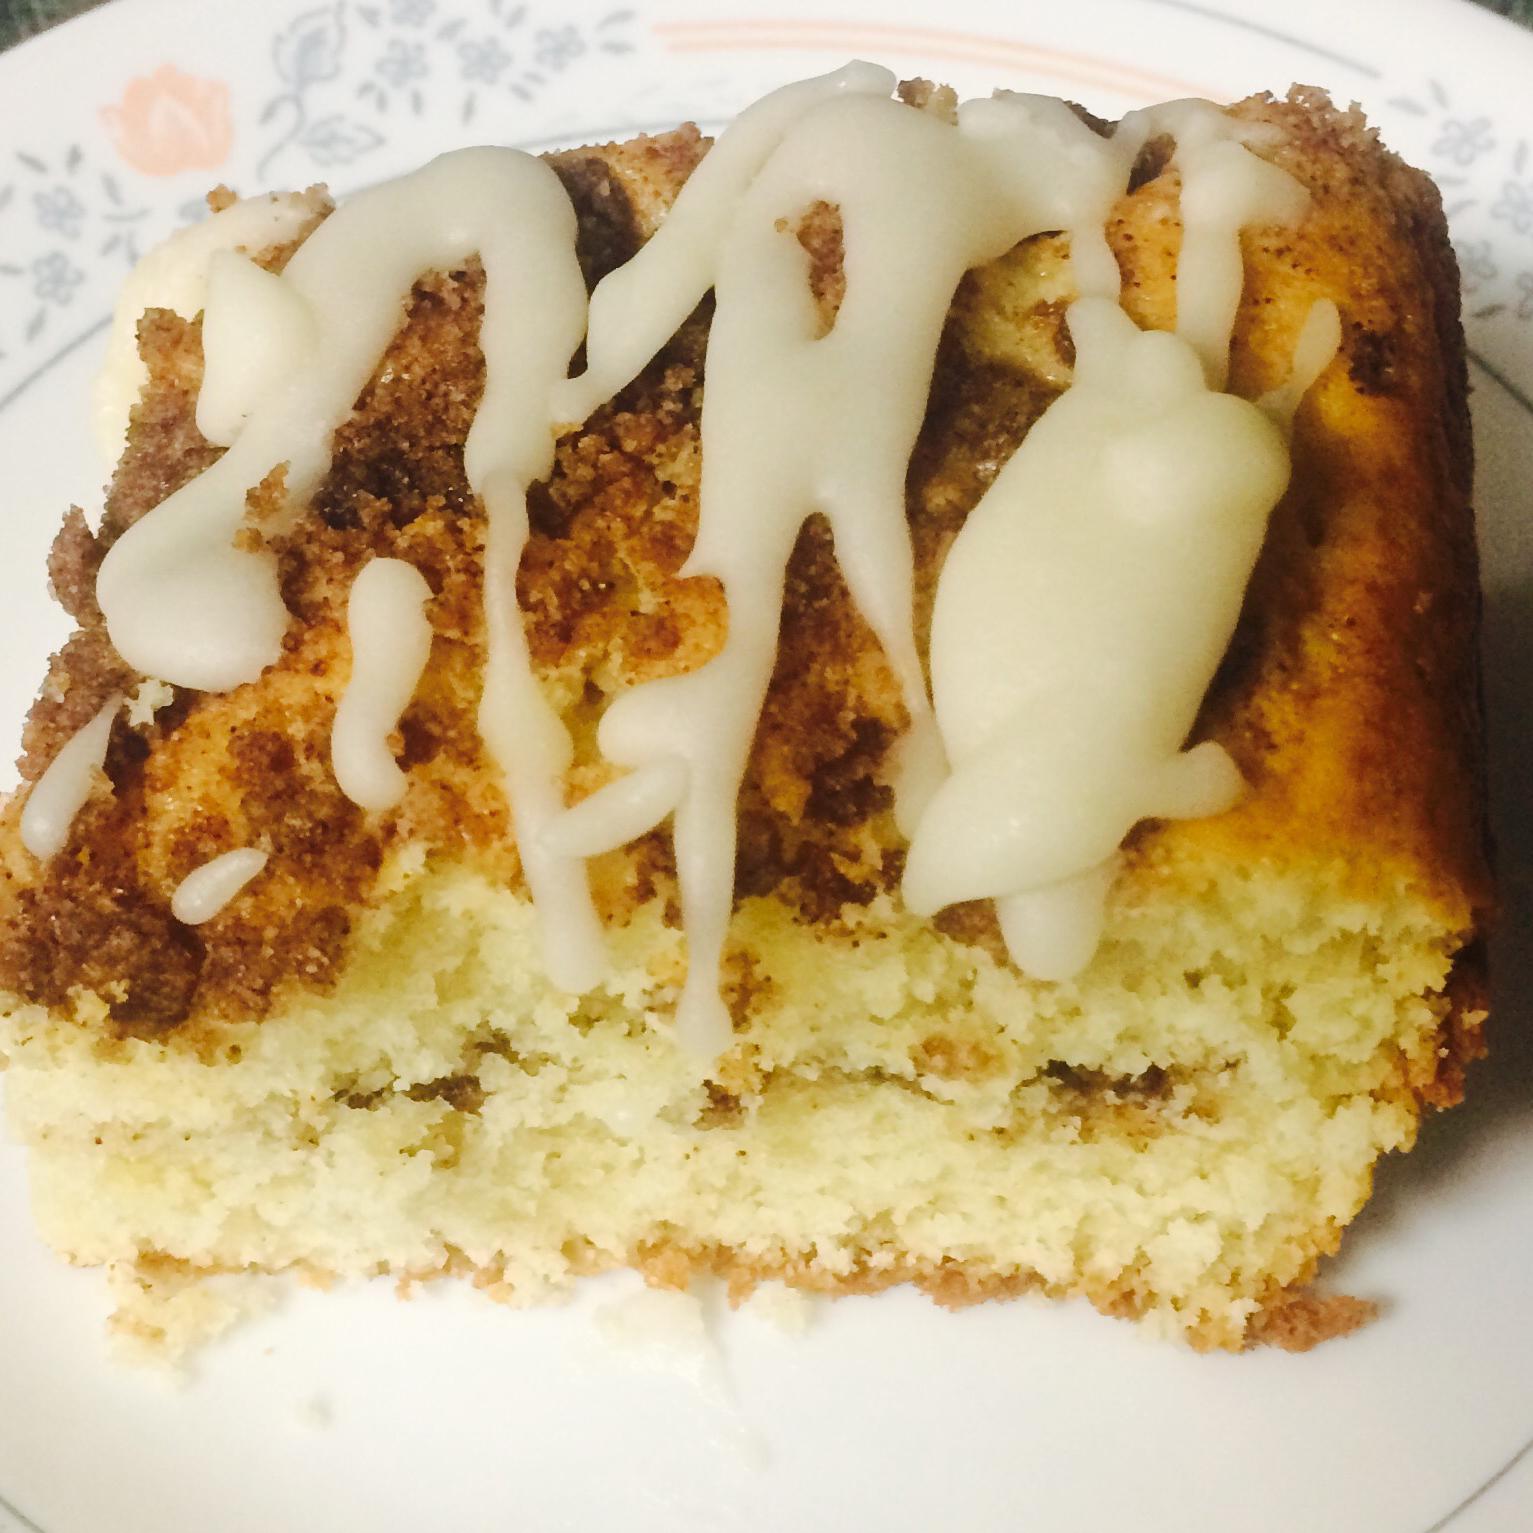 Cinnamon-Laced Coffee Cake Kathy Baldi